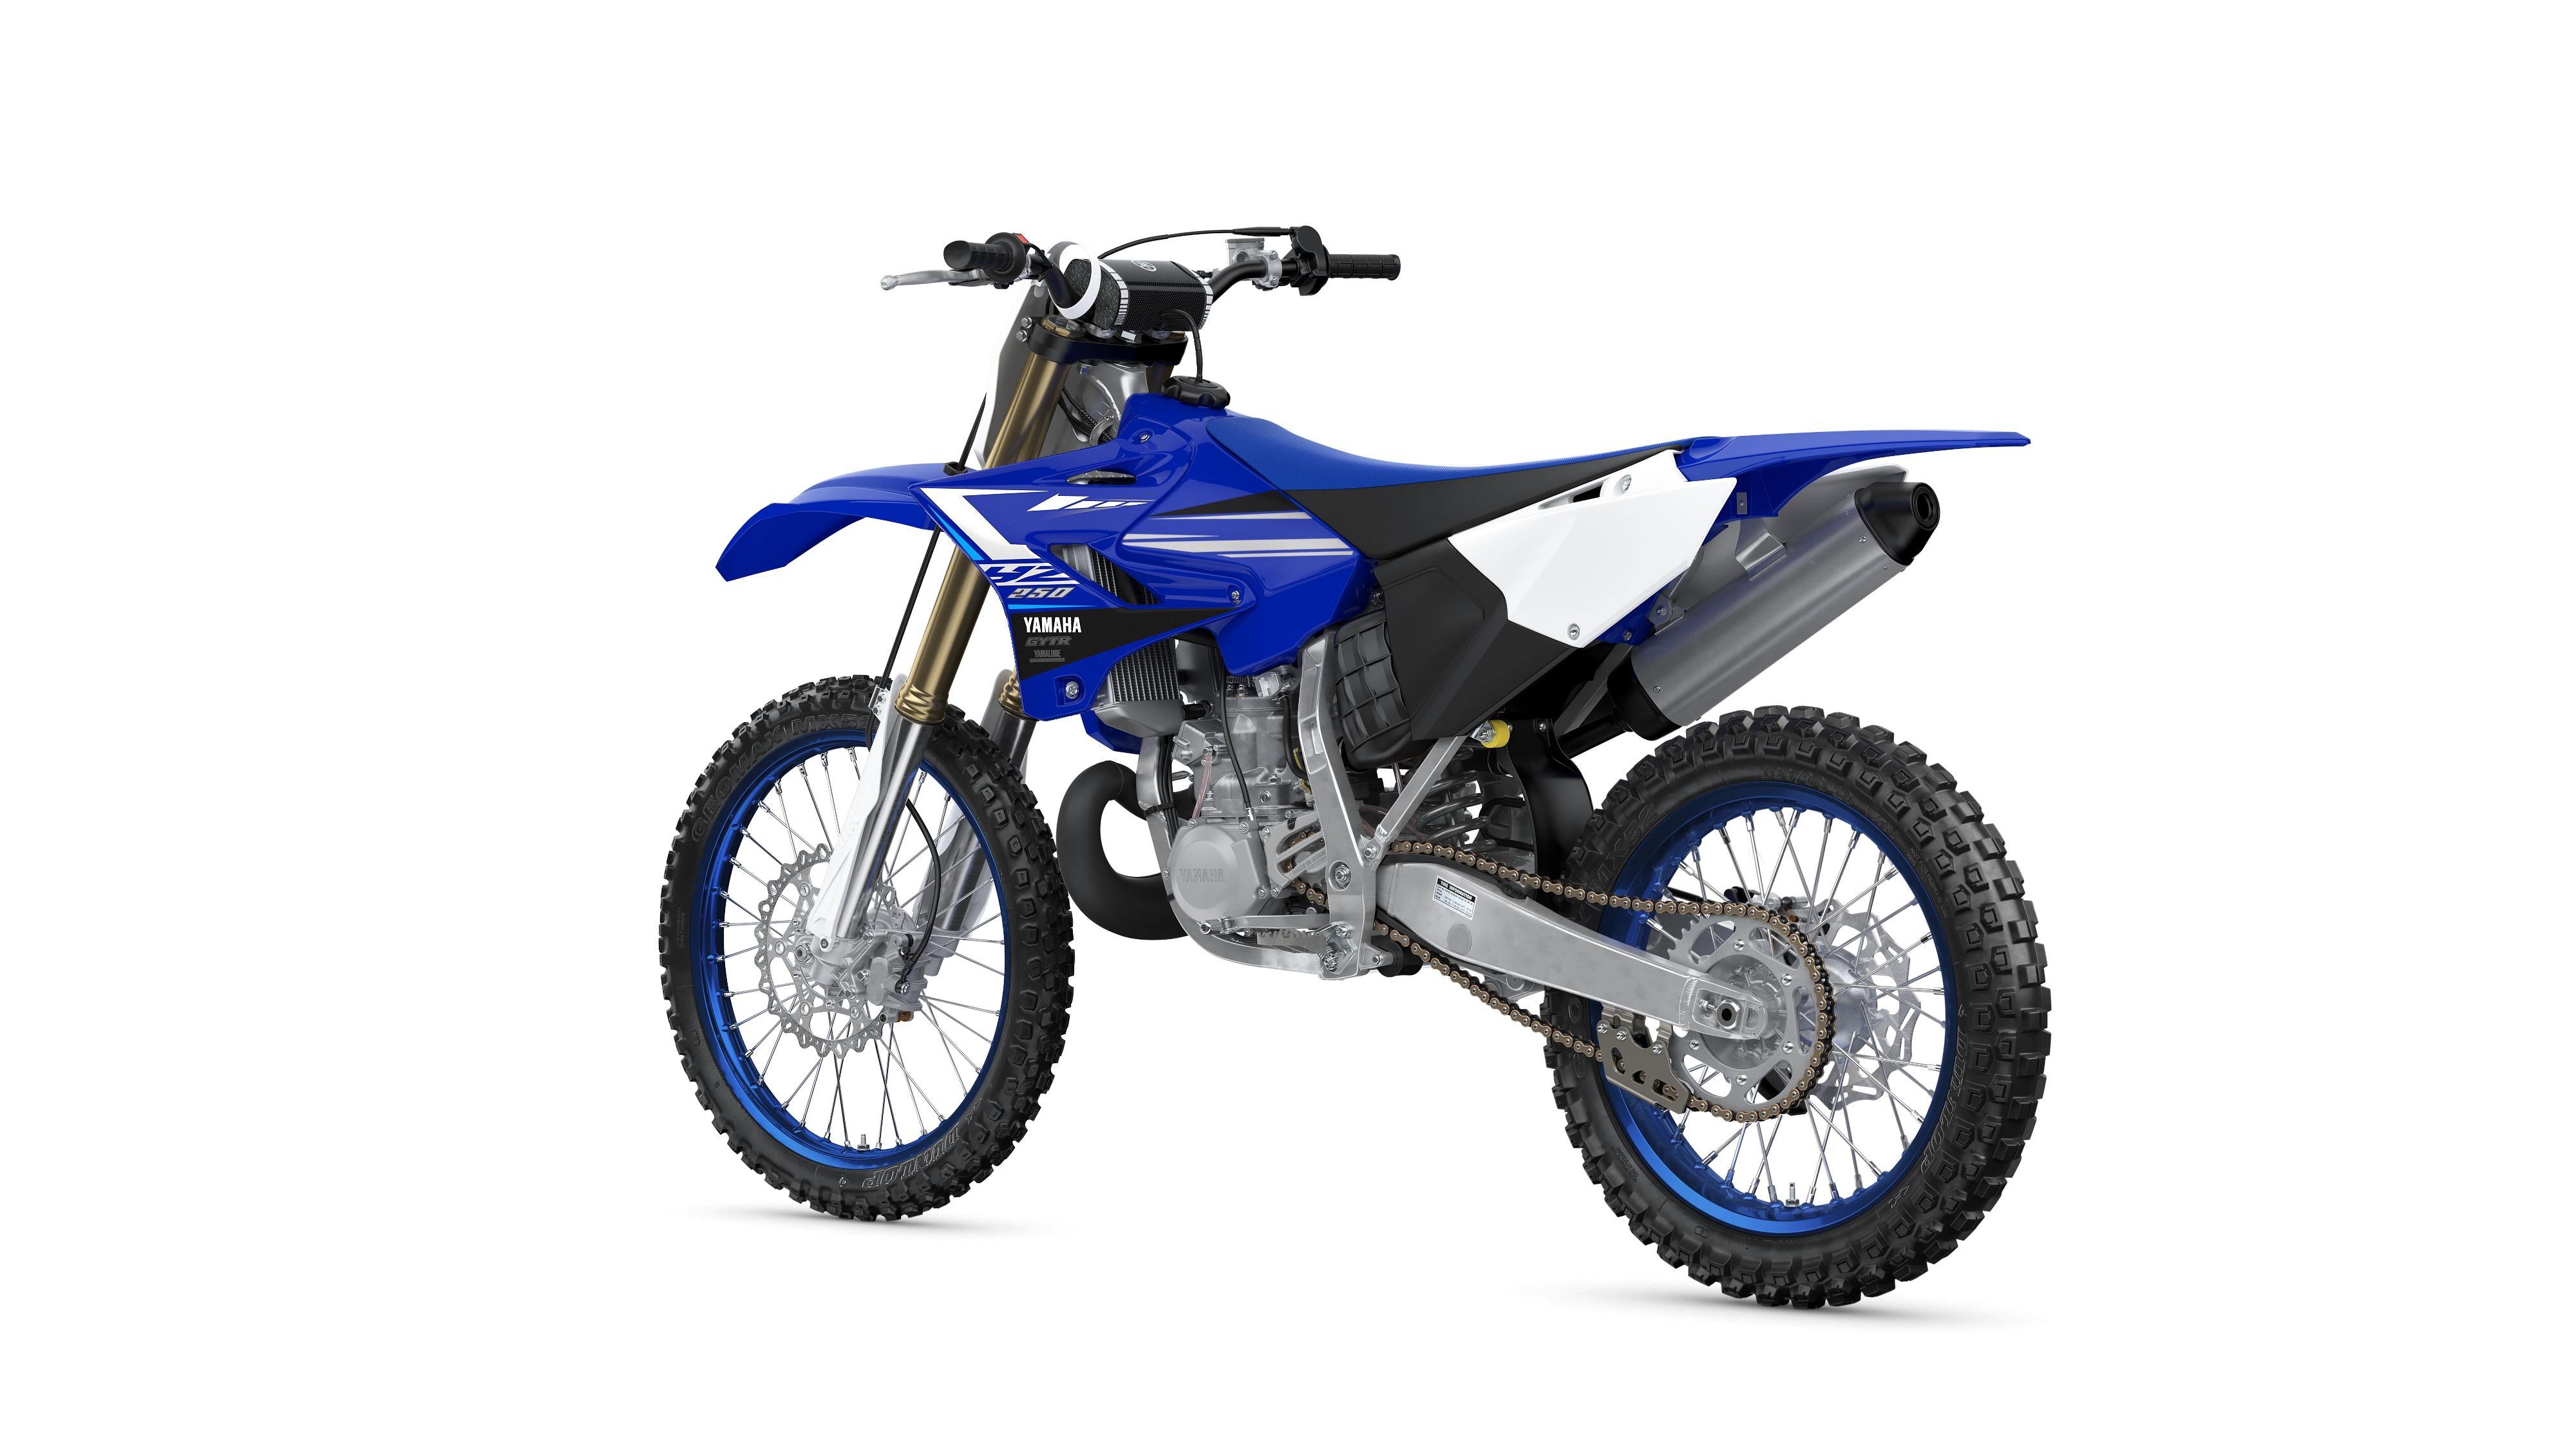 Yamaha YZ250 | MotorCentrumWest